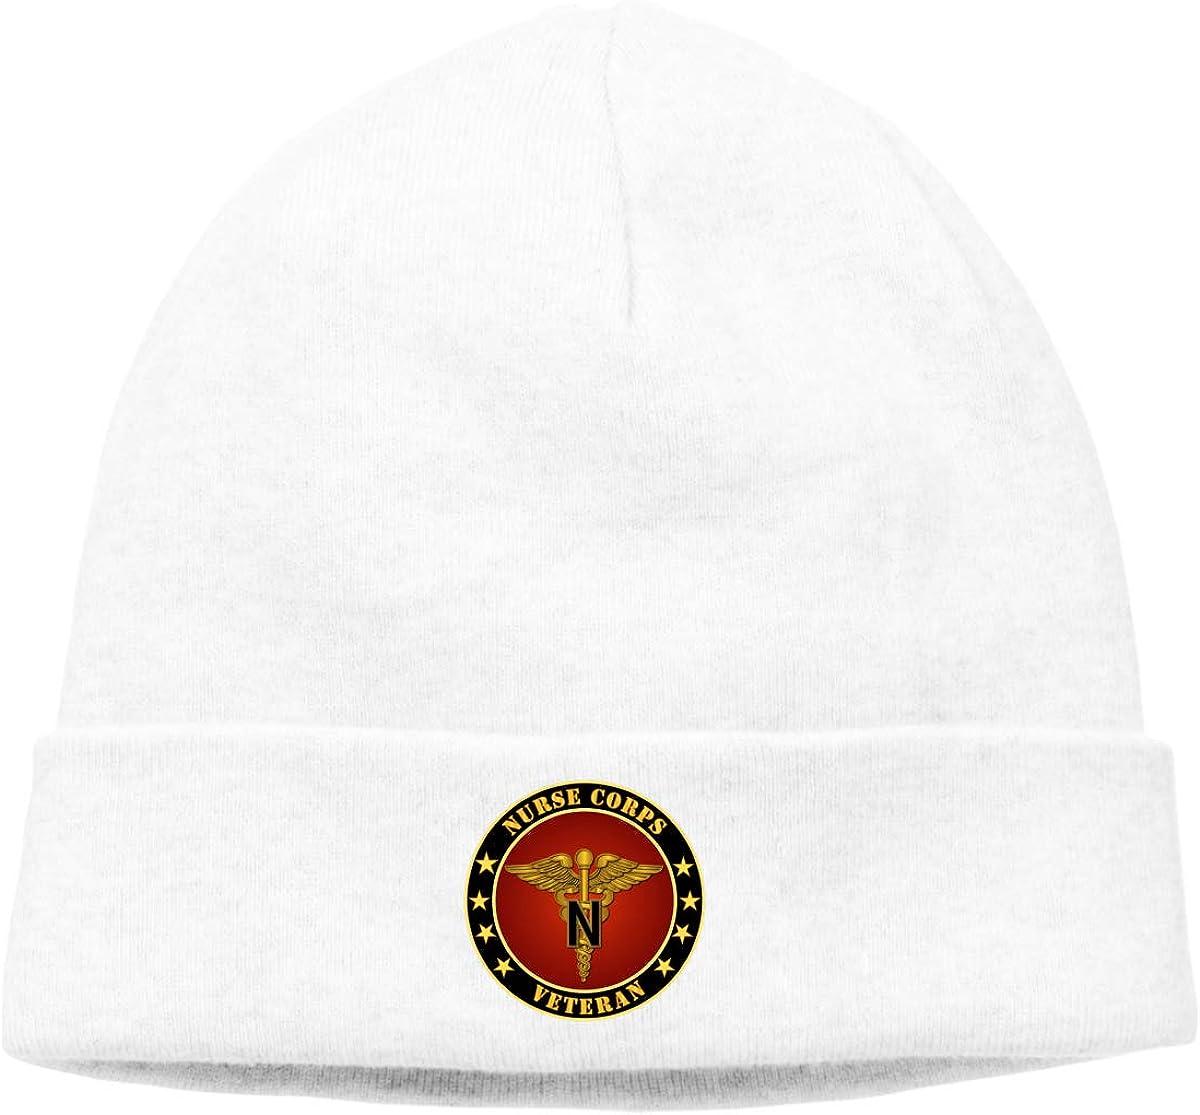 Lapptty Cap Army Nurse Corps Men Women Beanie Hat Knitted Beanie Knit Beanie